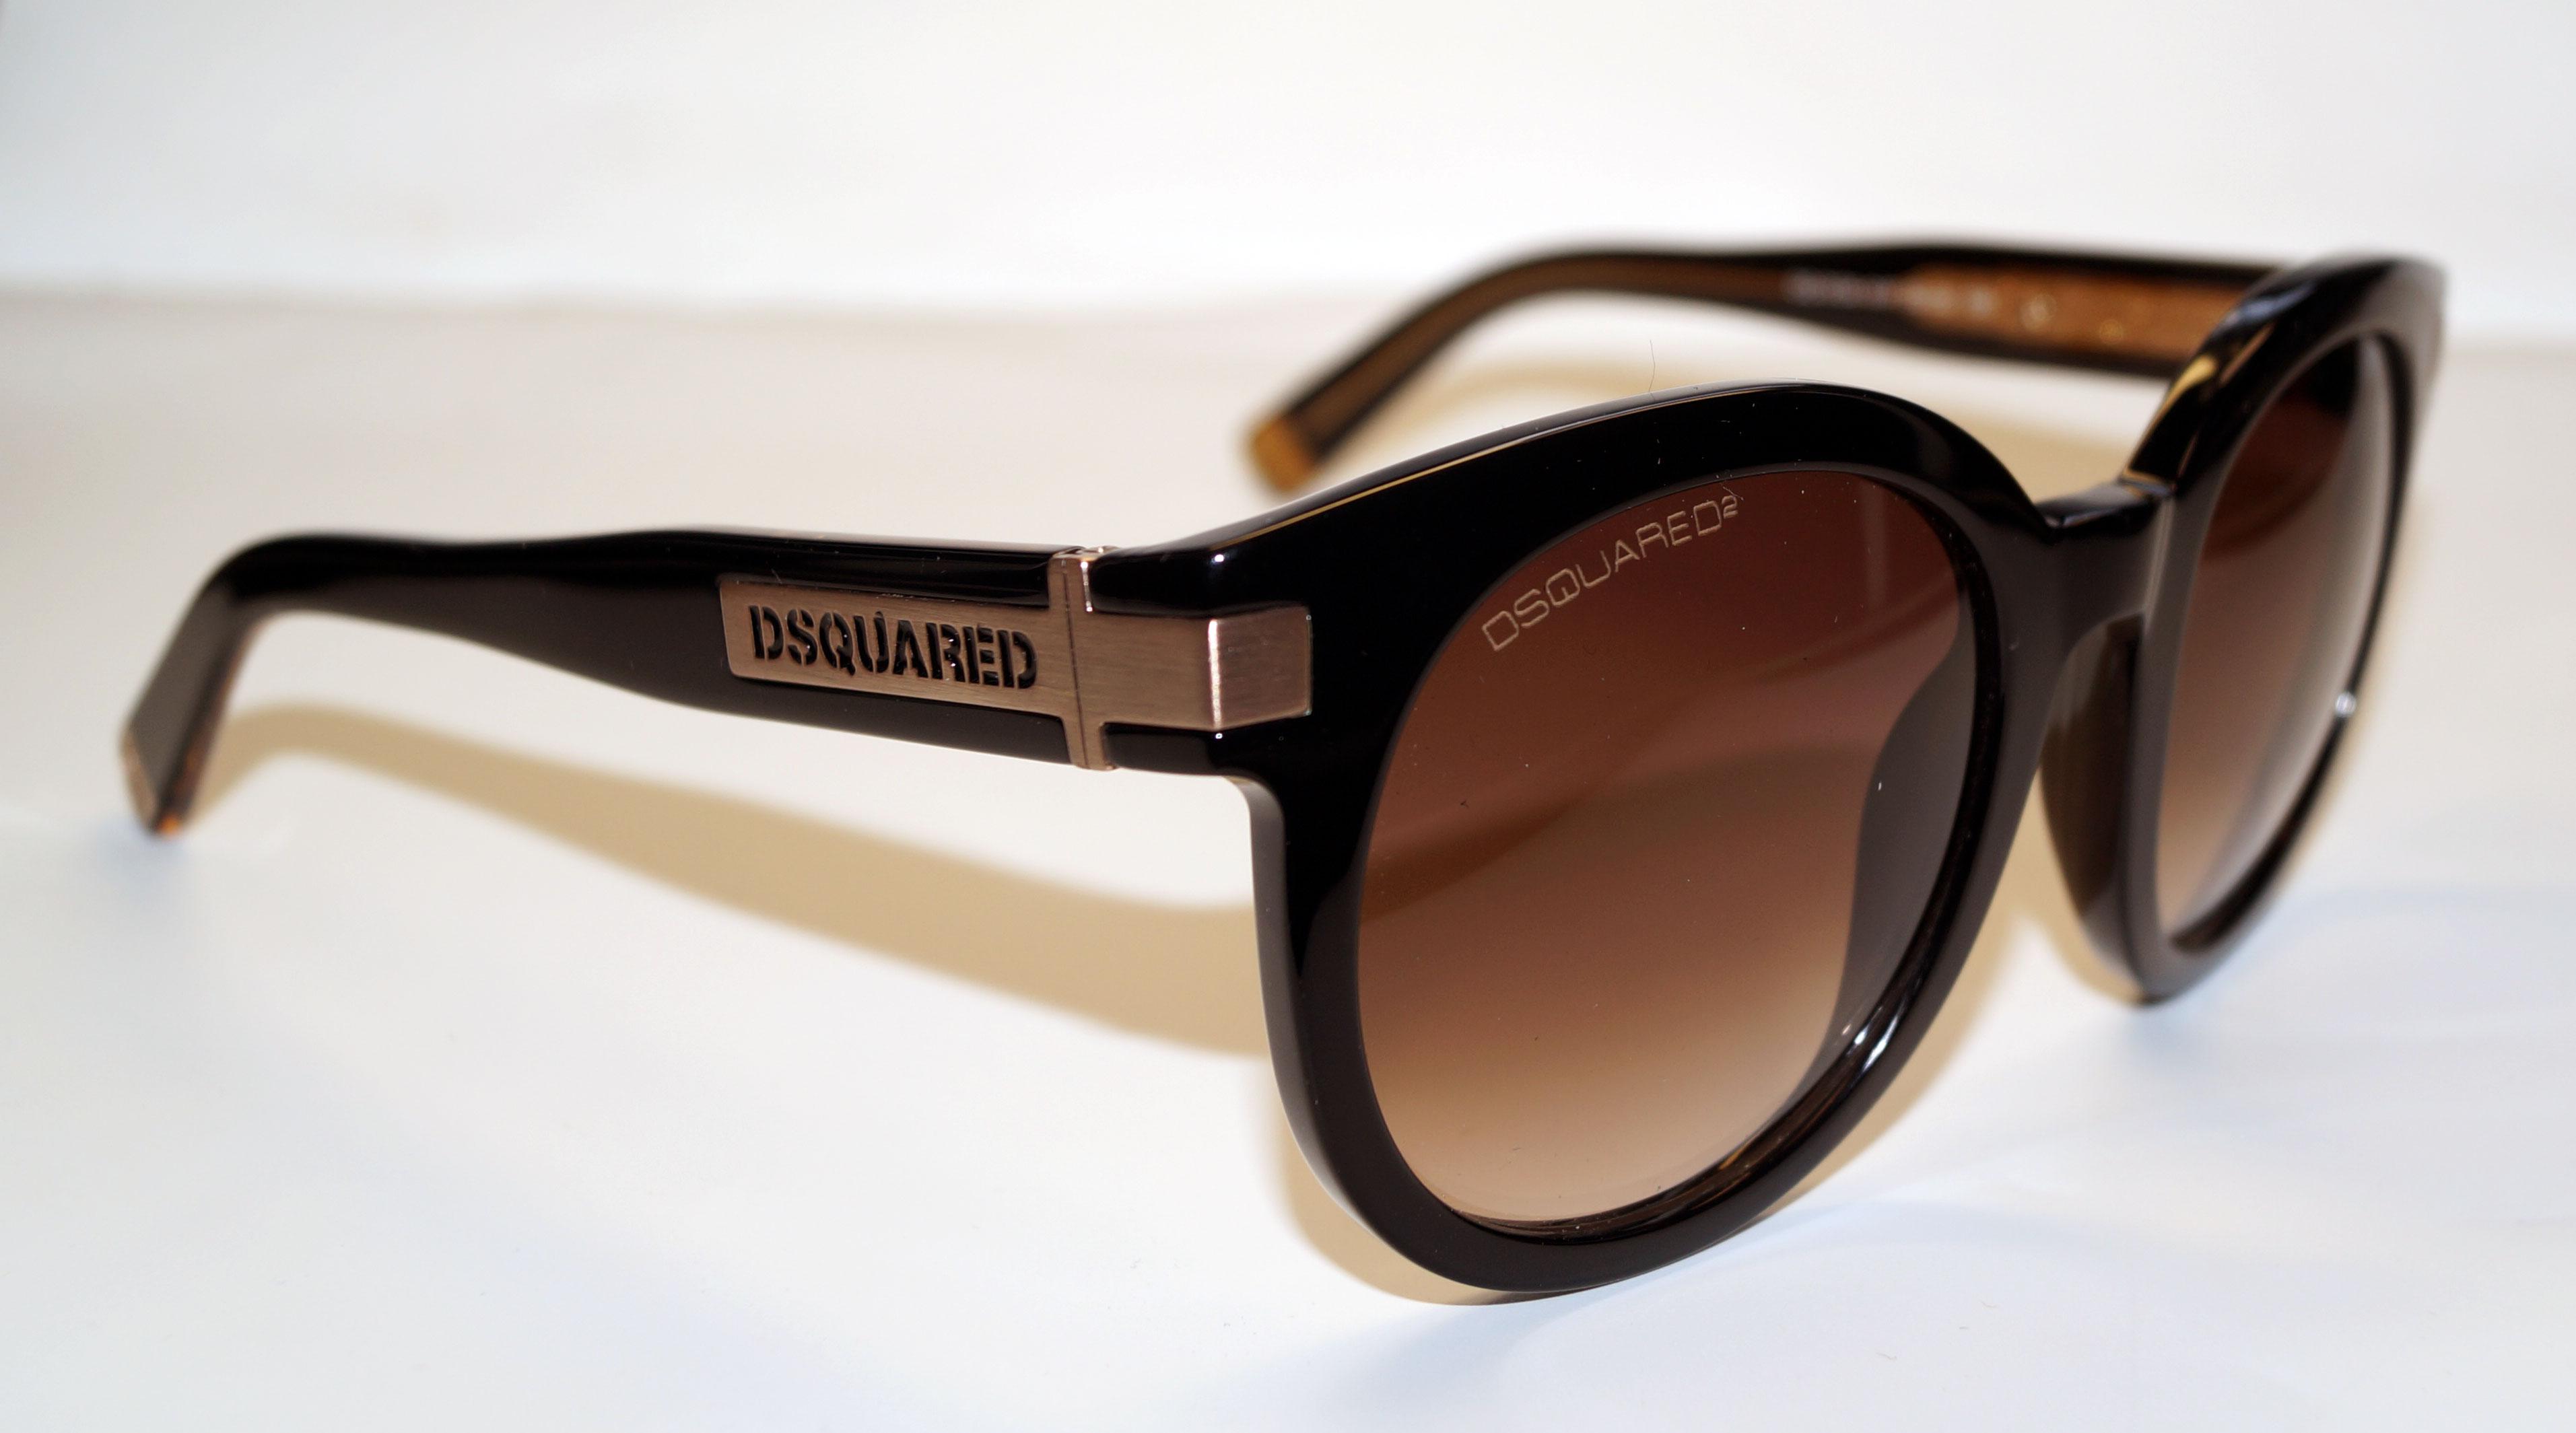 DSQUARED2 Sonnenbrille Sunglasses DQ 0134 01F